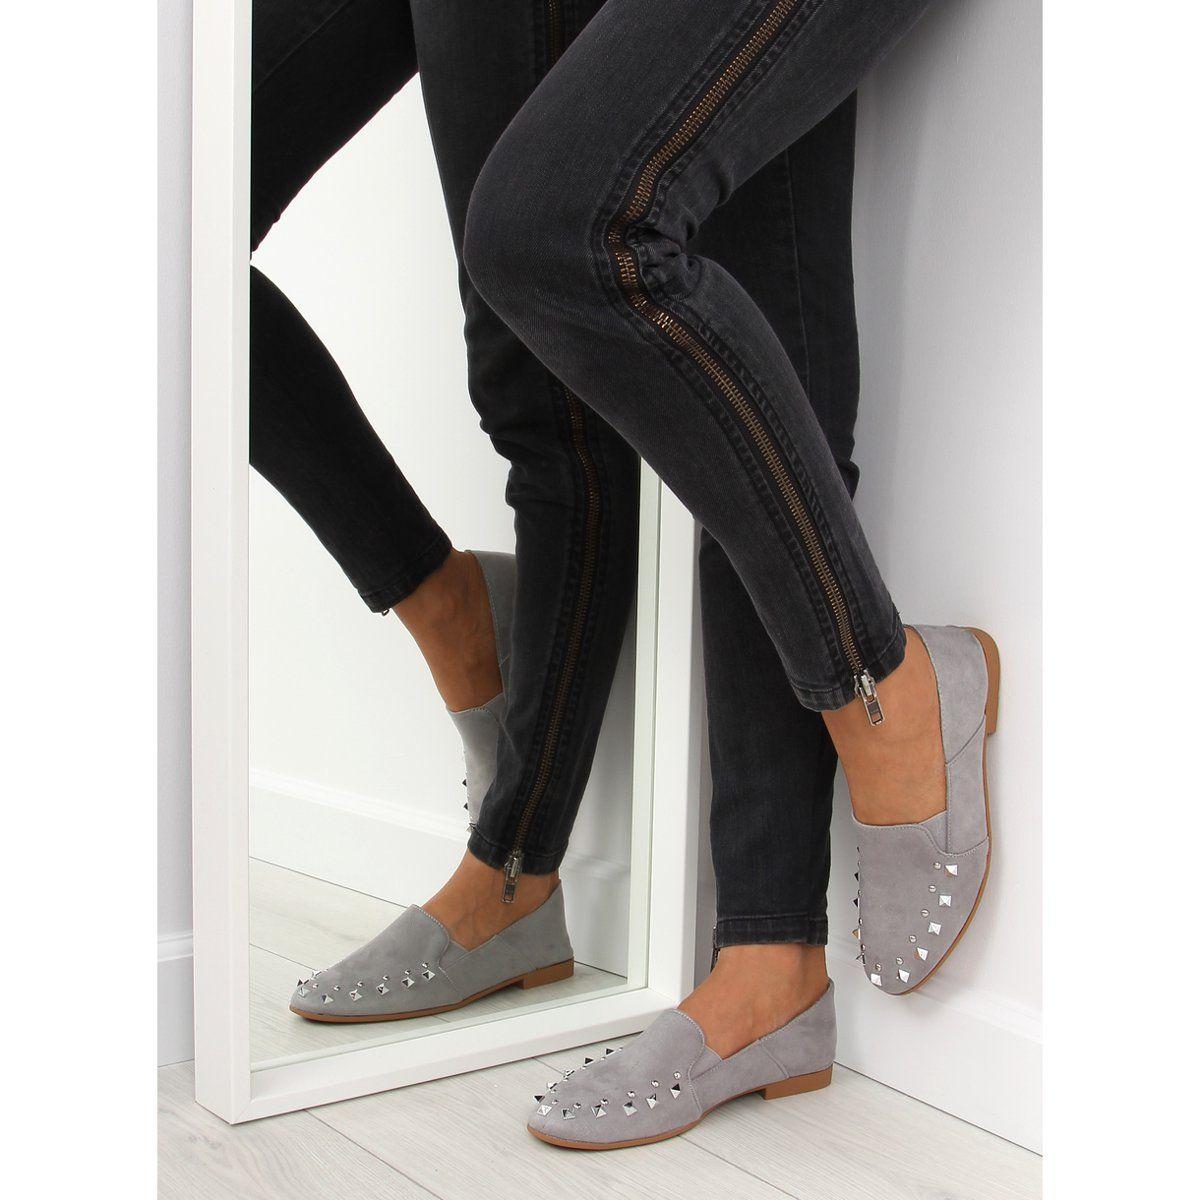 Mokasyny Lordsy Z Cwiekami Szare 1415 Grey Womens Sneakers Sneakers Blue Timeless Shoes